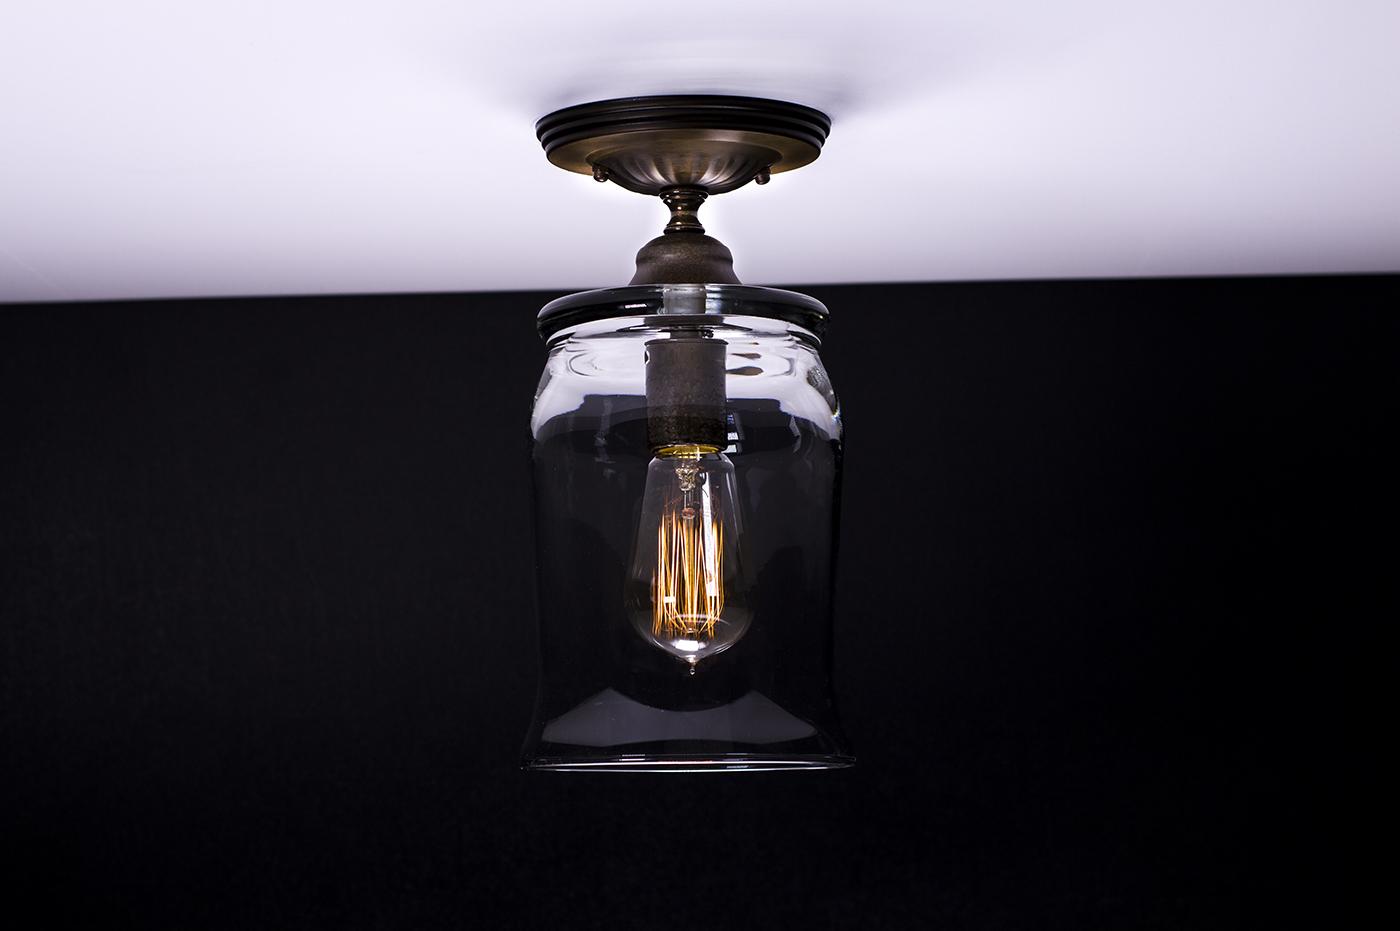 Ceiling Lights Edison : Flush ceiling mount edison light fixture oil rubbed